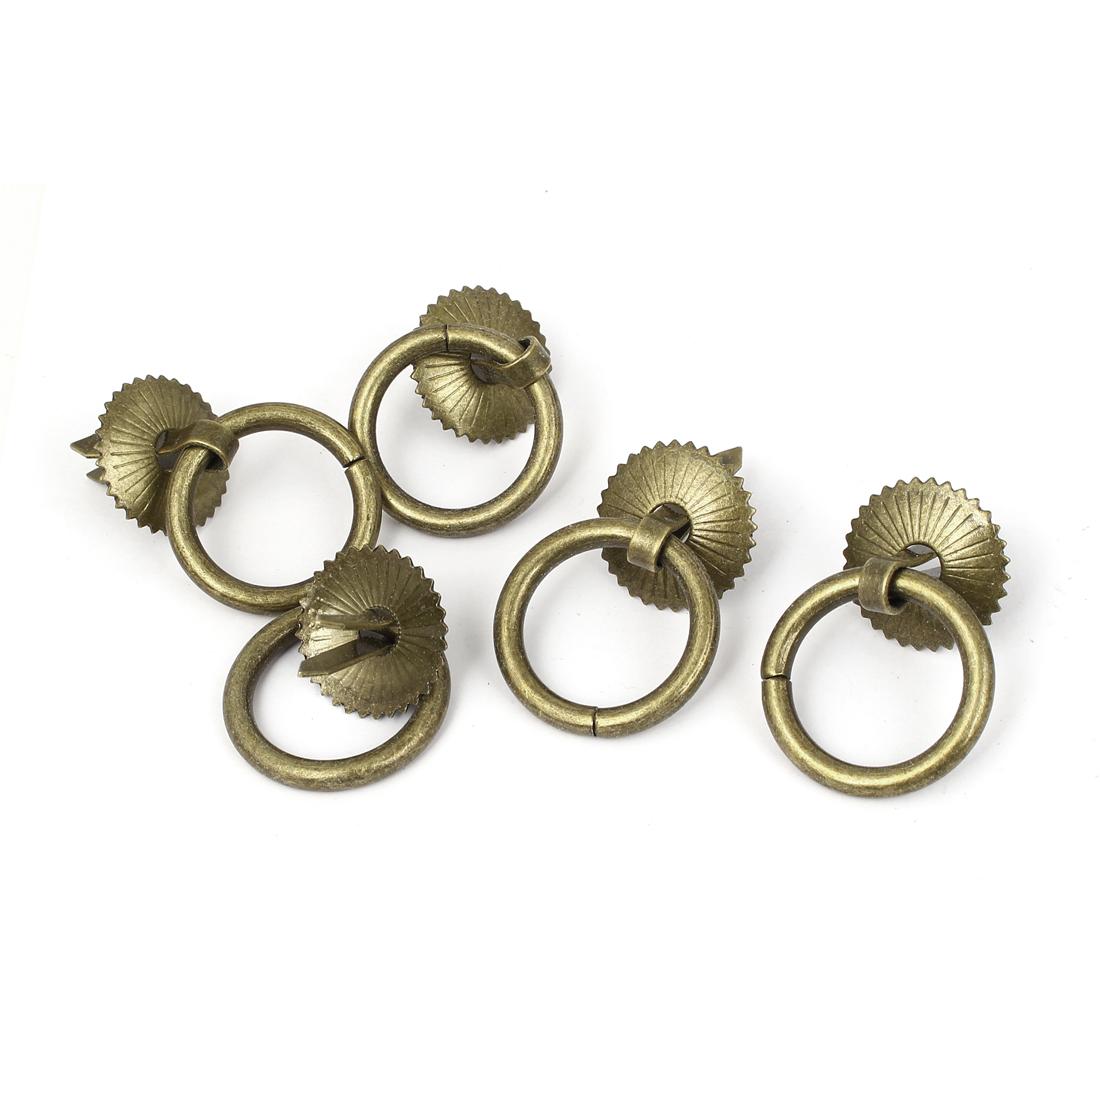 Wooden Case Jewellery Box Retro Style Round Design Pull Handle Ring 30mm Dia 5pcs